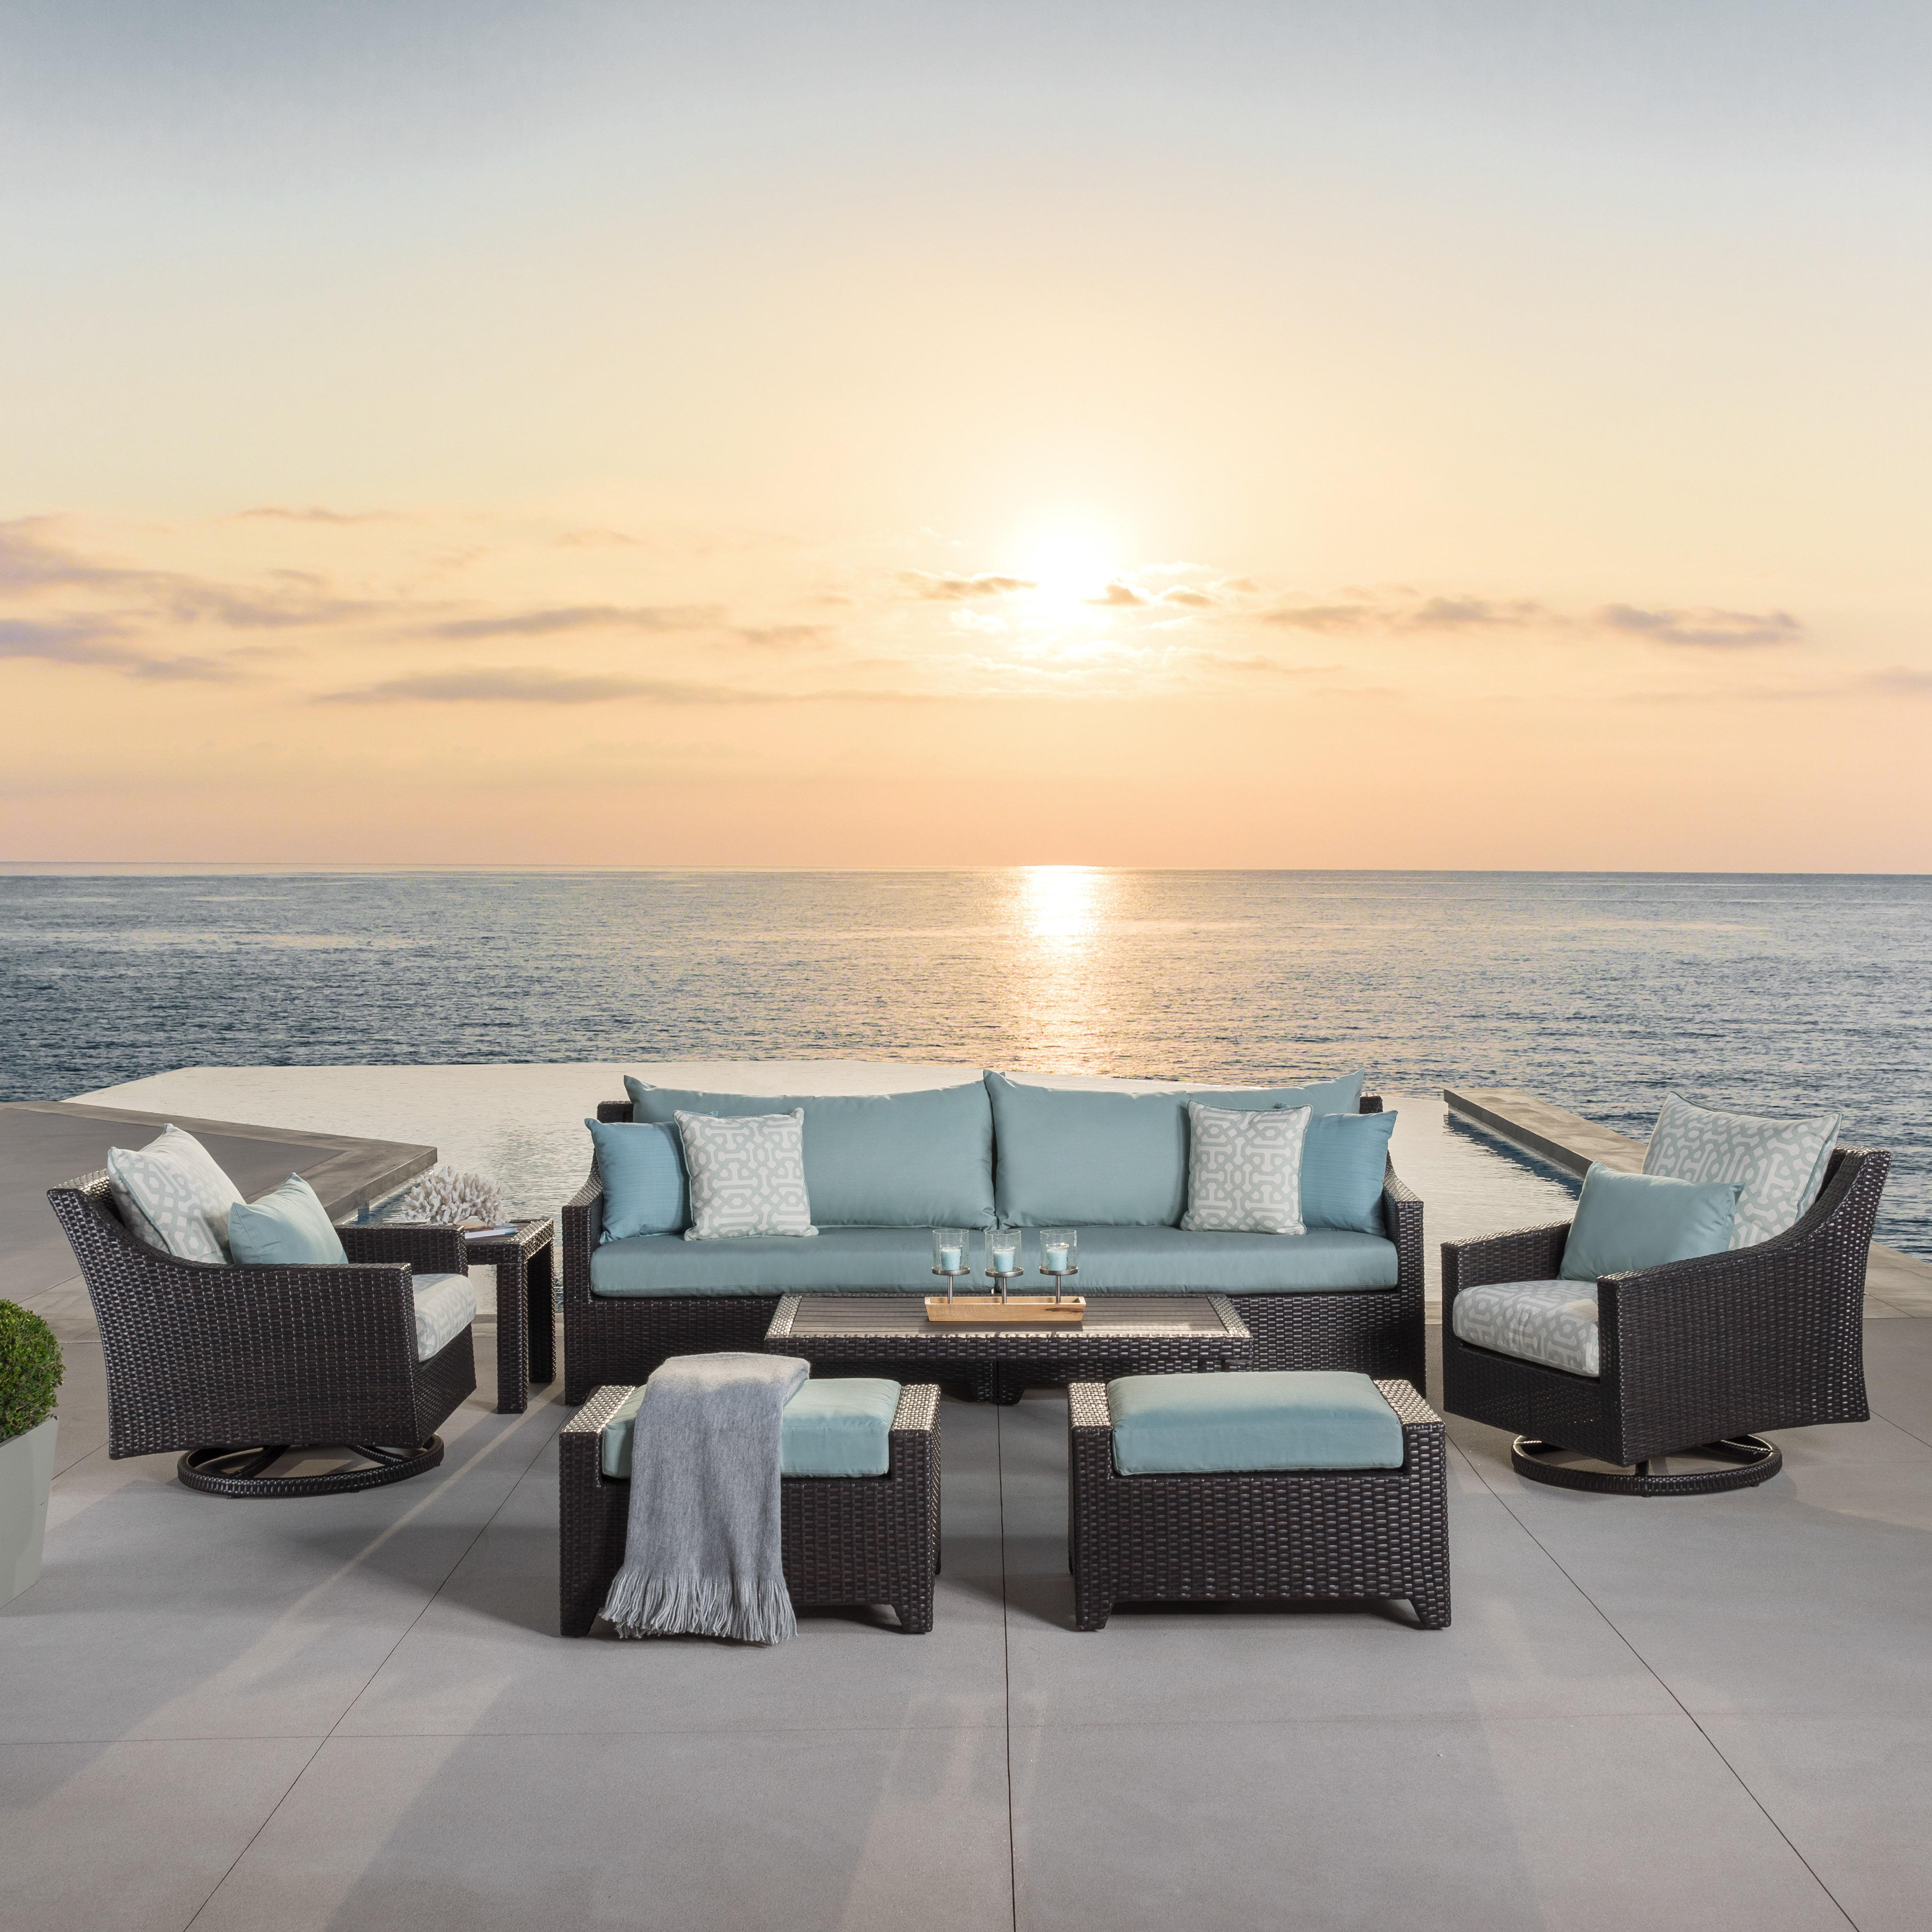 Three Posts Northridge 8 Piece Sofa Set with Cushions & Reviews ...